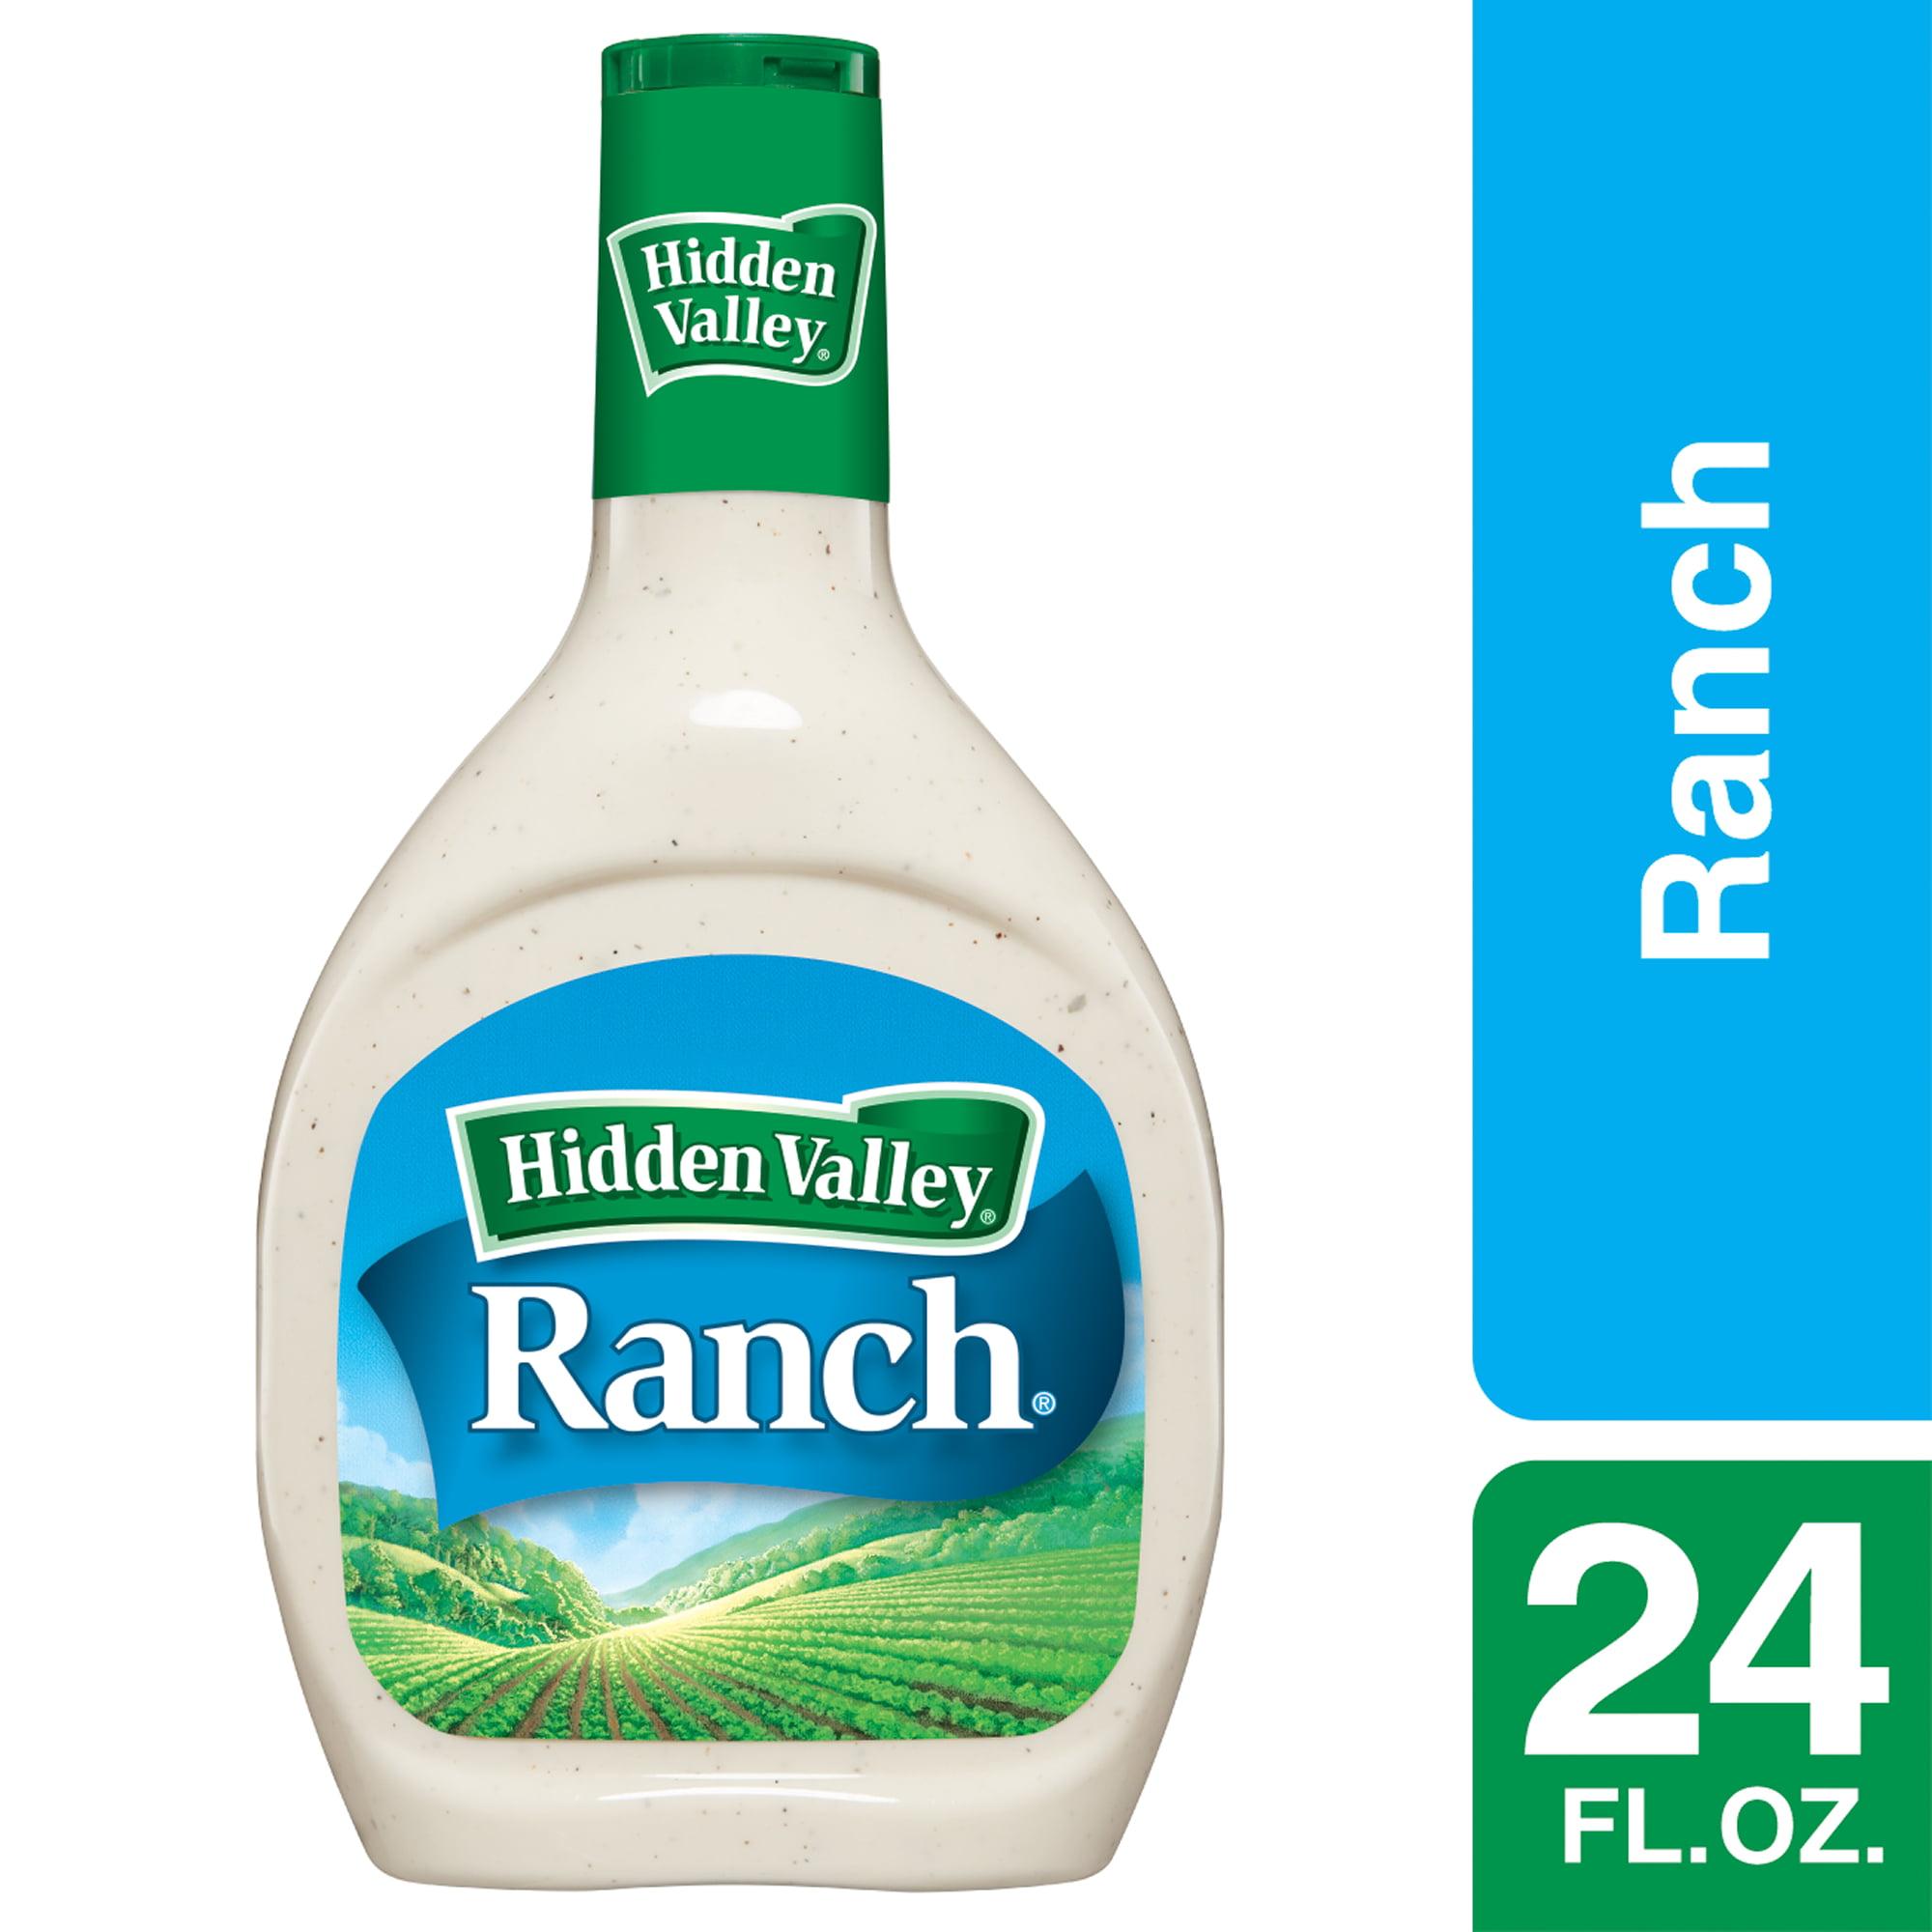 Hidden Valley Original Ranch Salad Dressing & Topping, Gluten Free - 24 oz Bottle